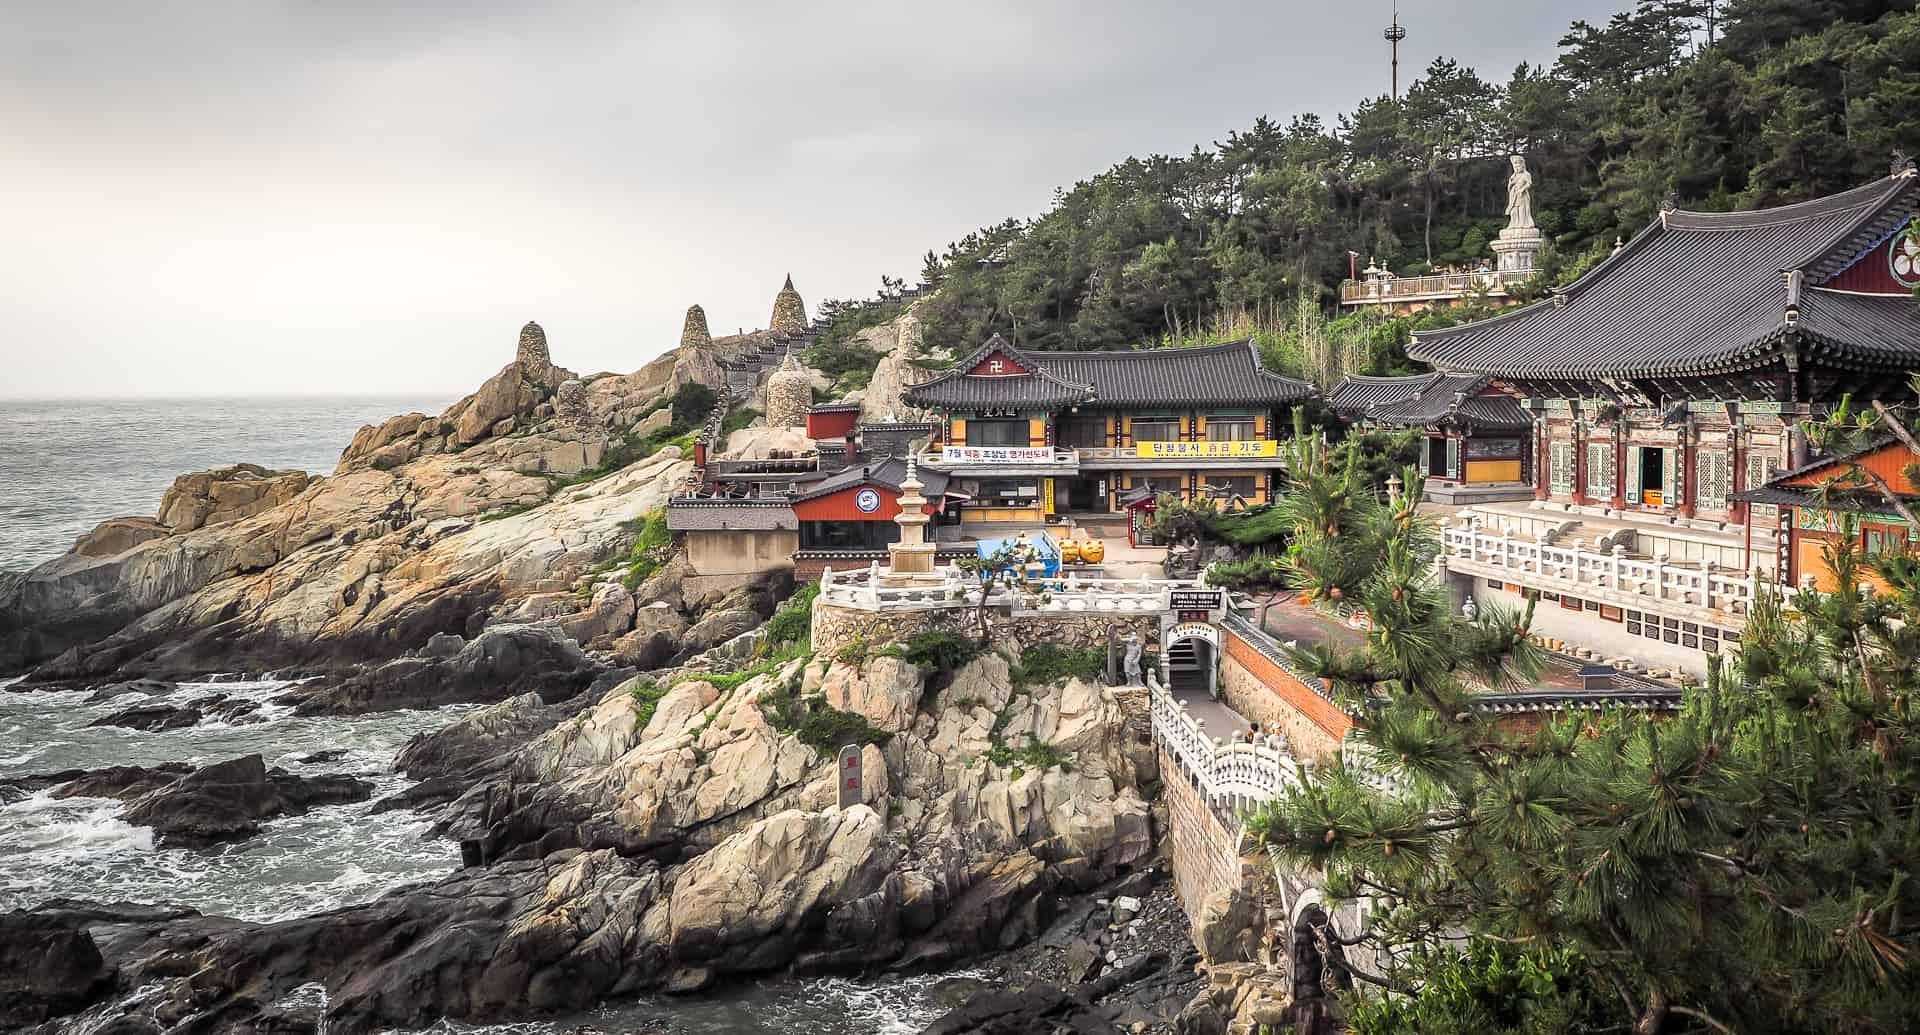 How to visit Haedong Yonggungsa Temple in Busan, South Korea